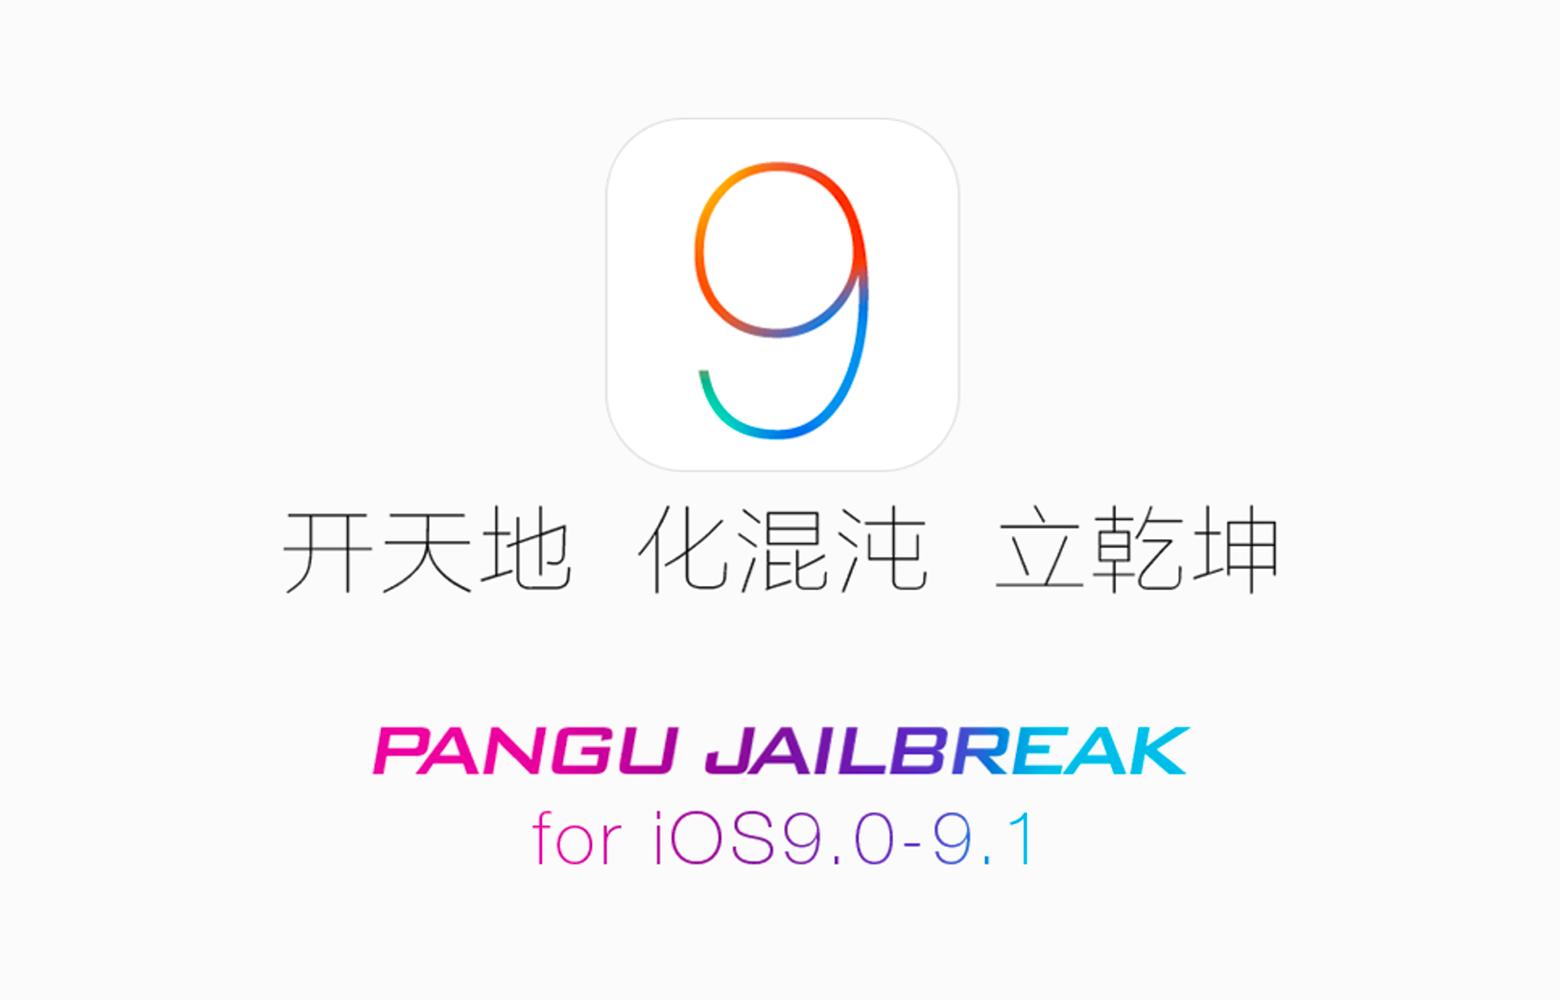 como-hacer-jailbreak-iphone-ipad-ios-9-1-mac-windows